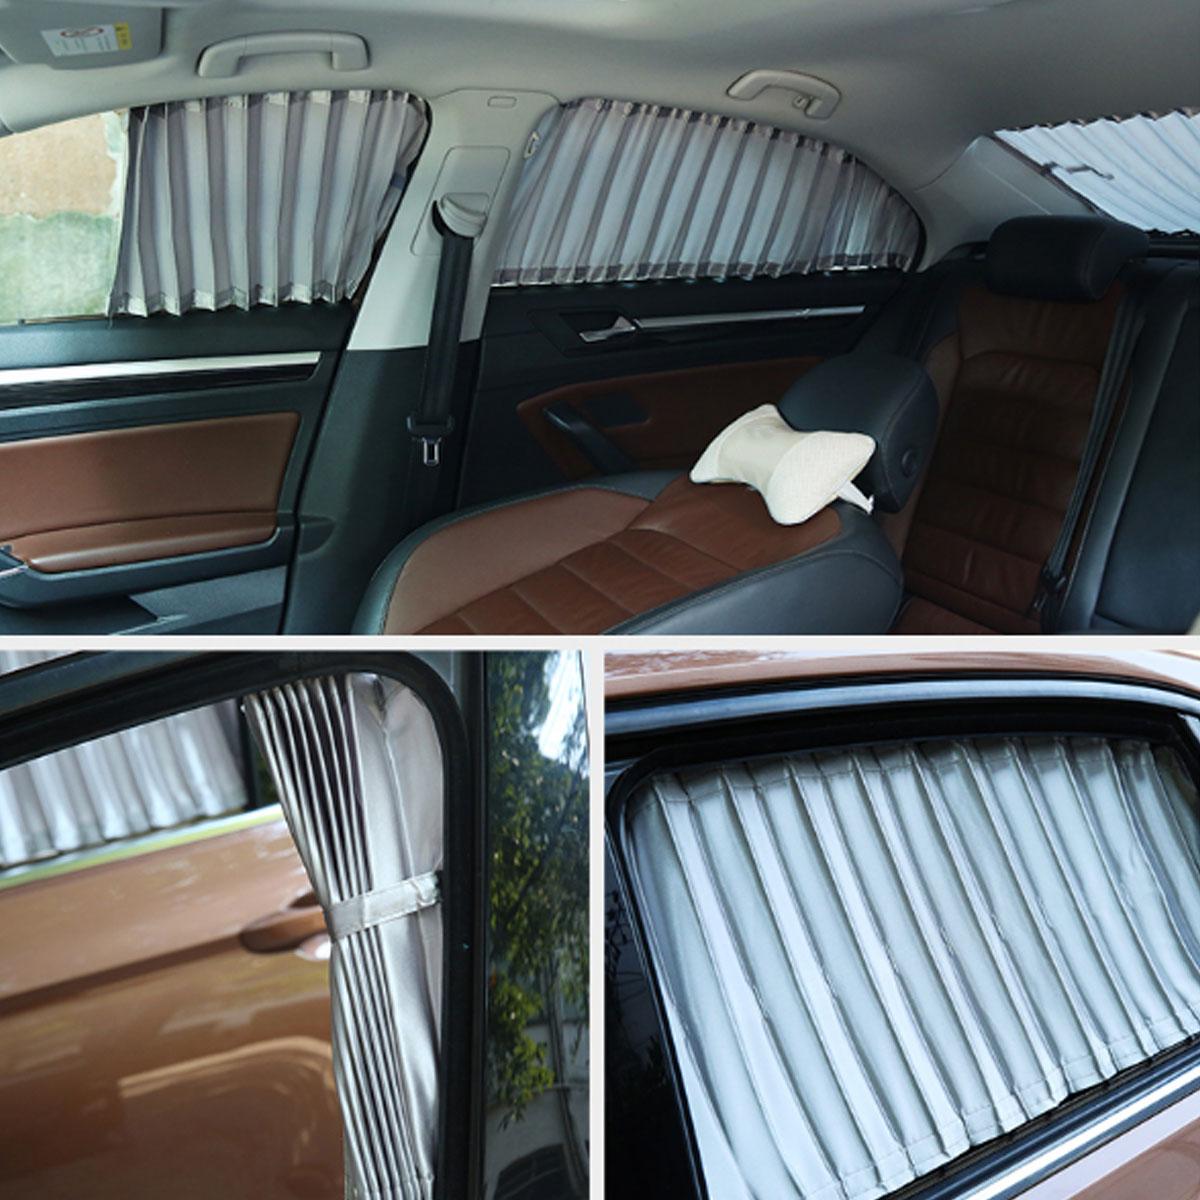 70cm Long Universal Retractable Car Vehicle Curtains Window Roller Sun Shades Blind ProtectorsGrey